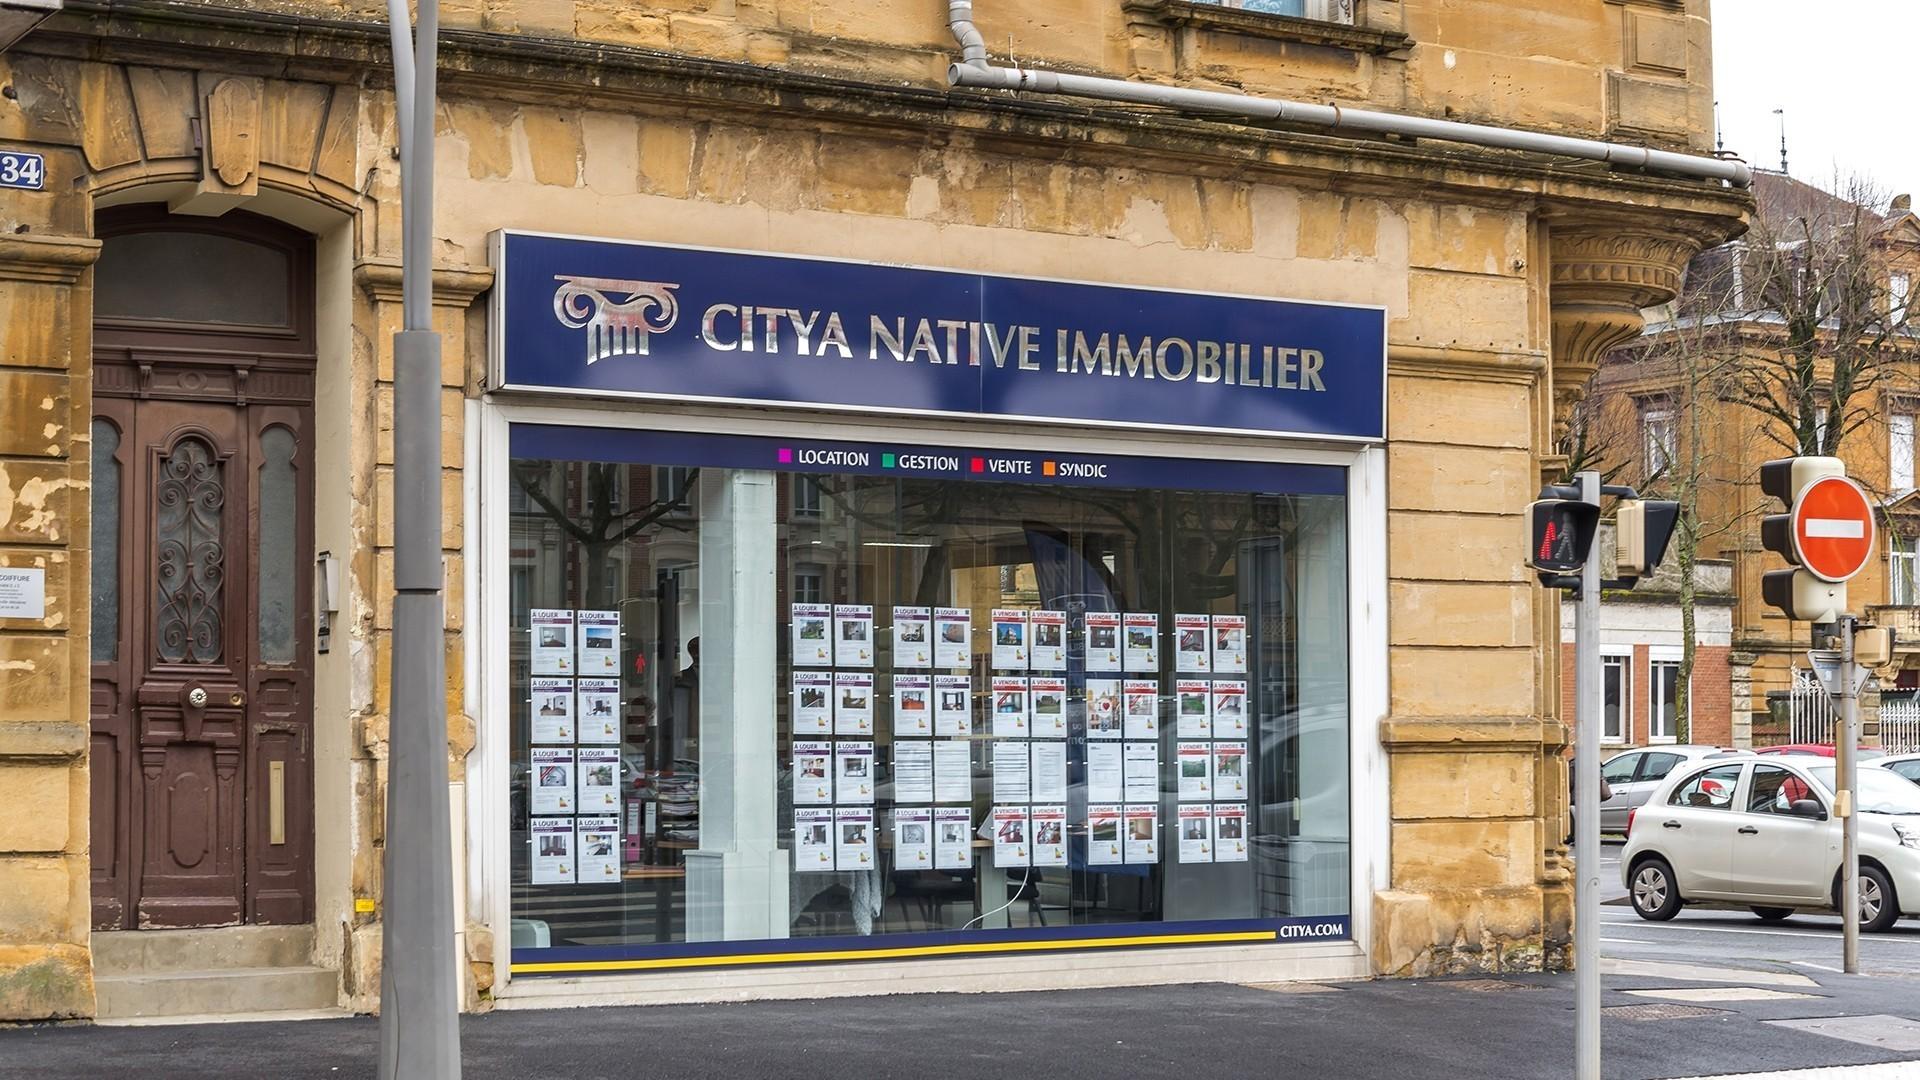 Agence immo Citya Native Charleville-Mézières